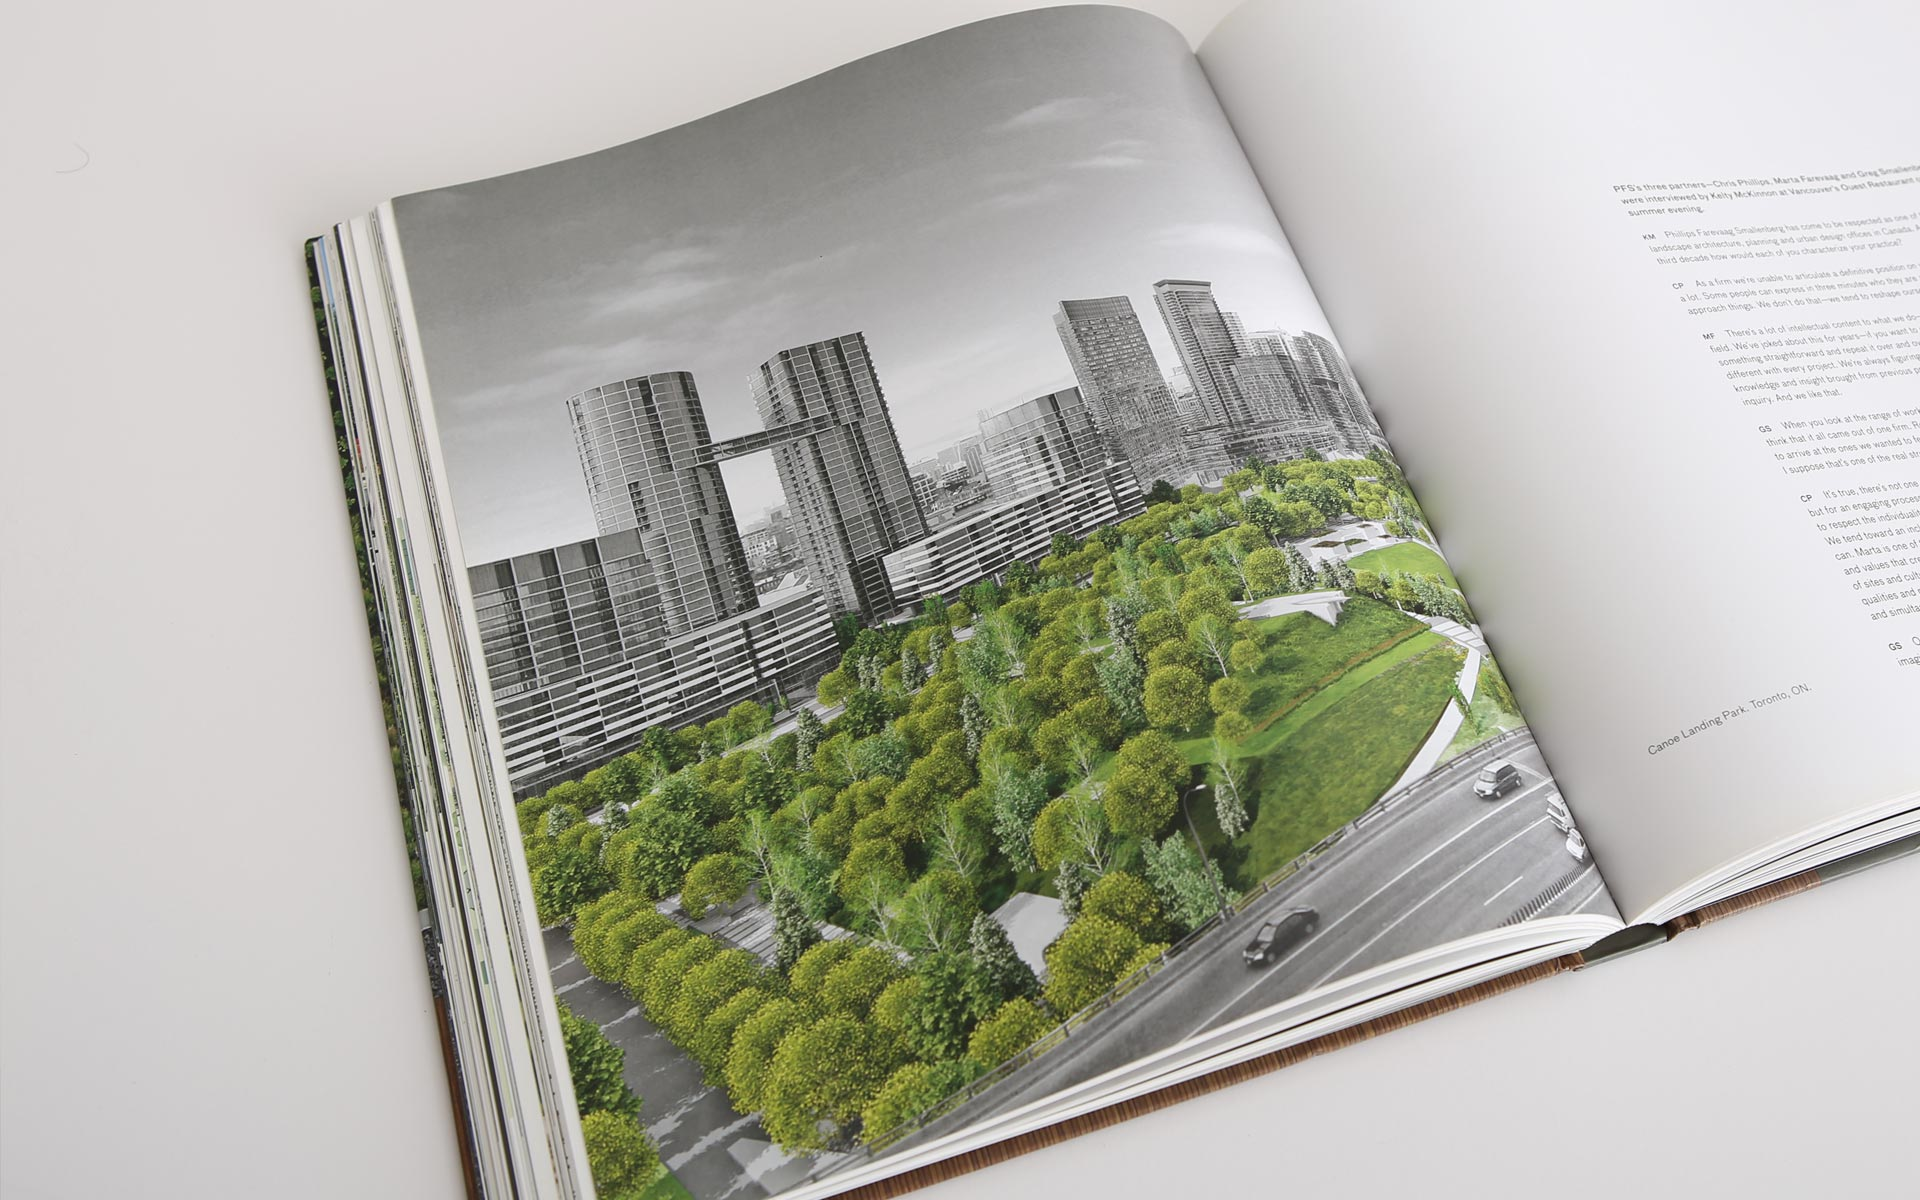 pfs-landscape-architects-book-design-7